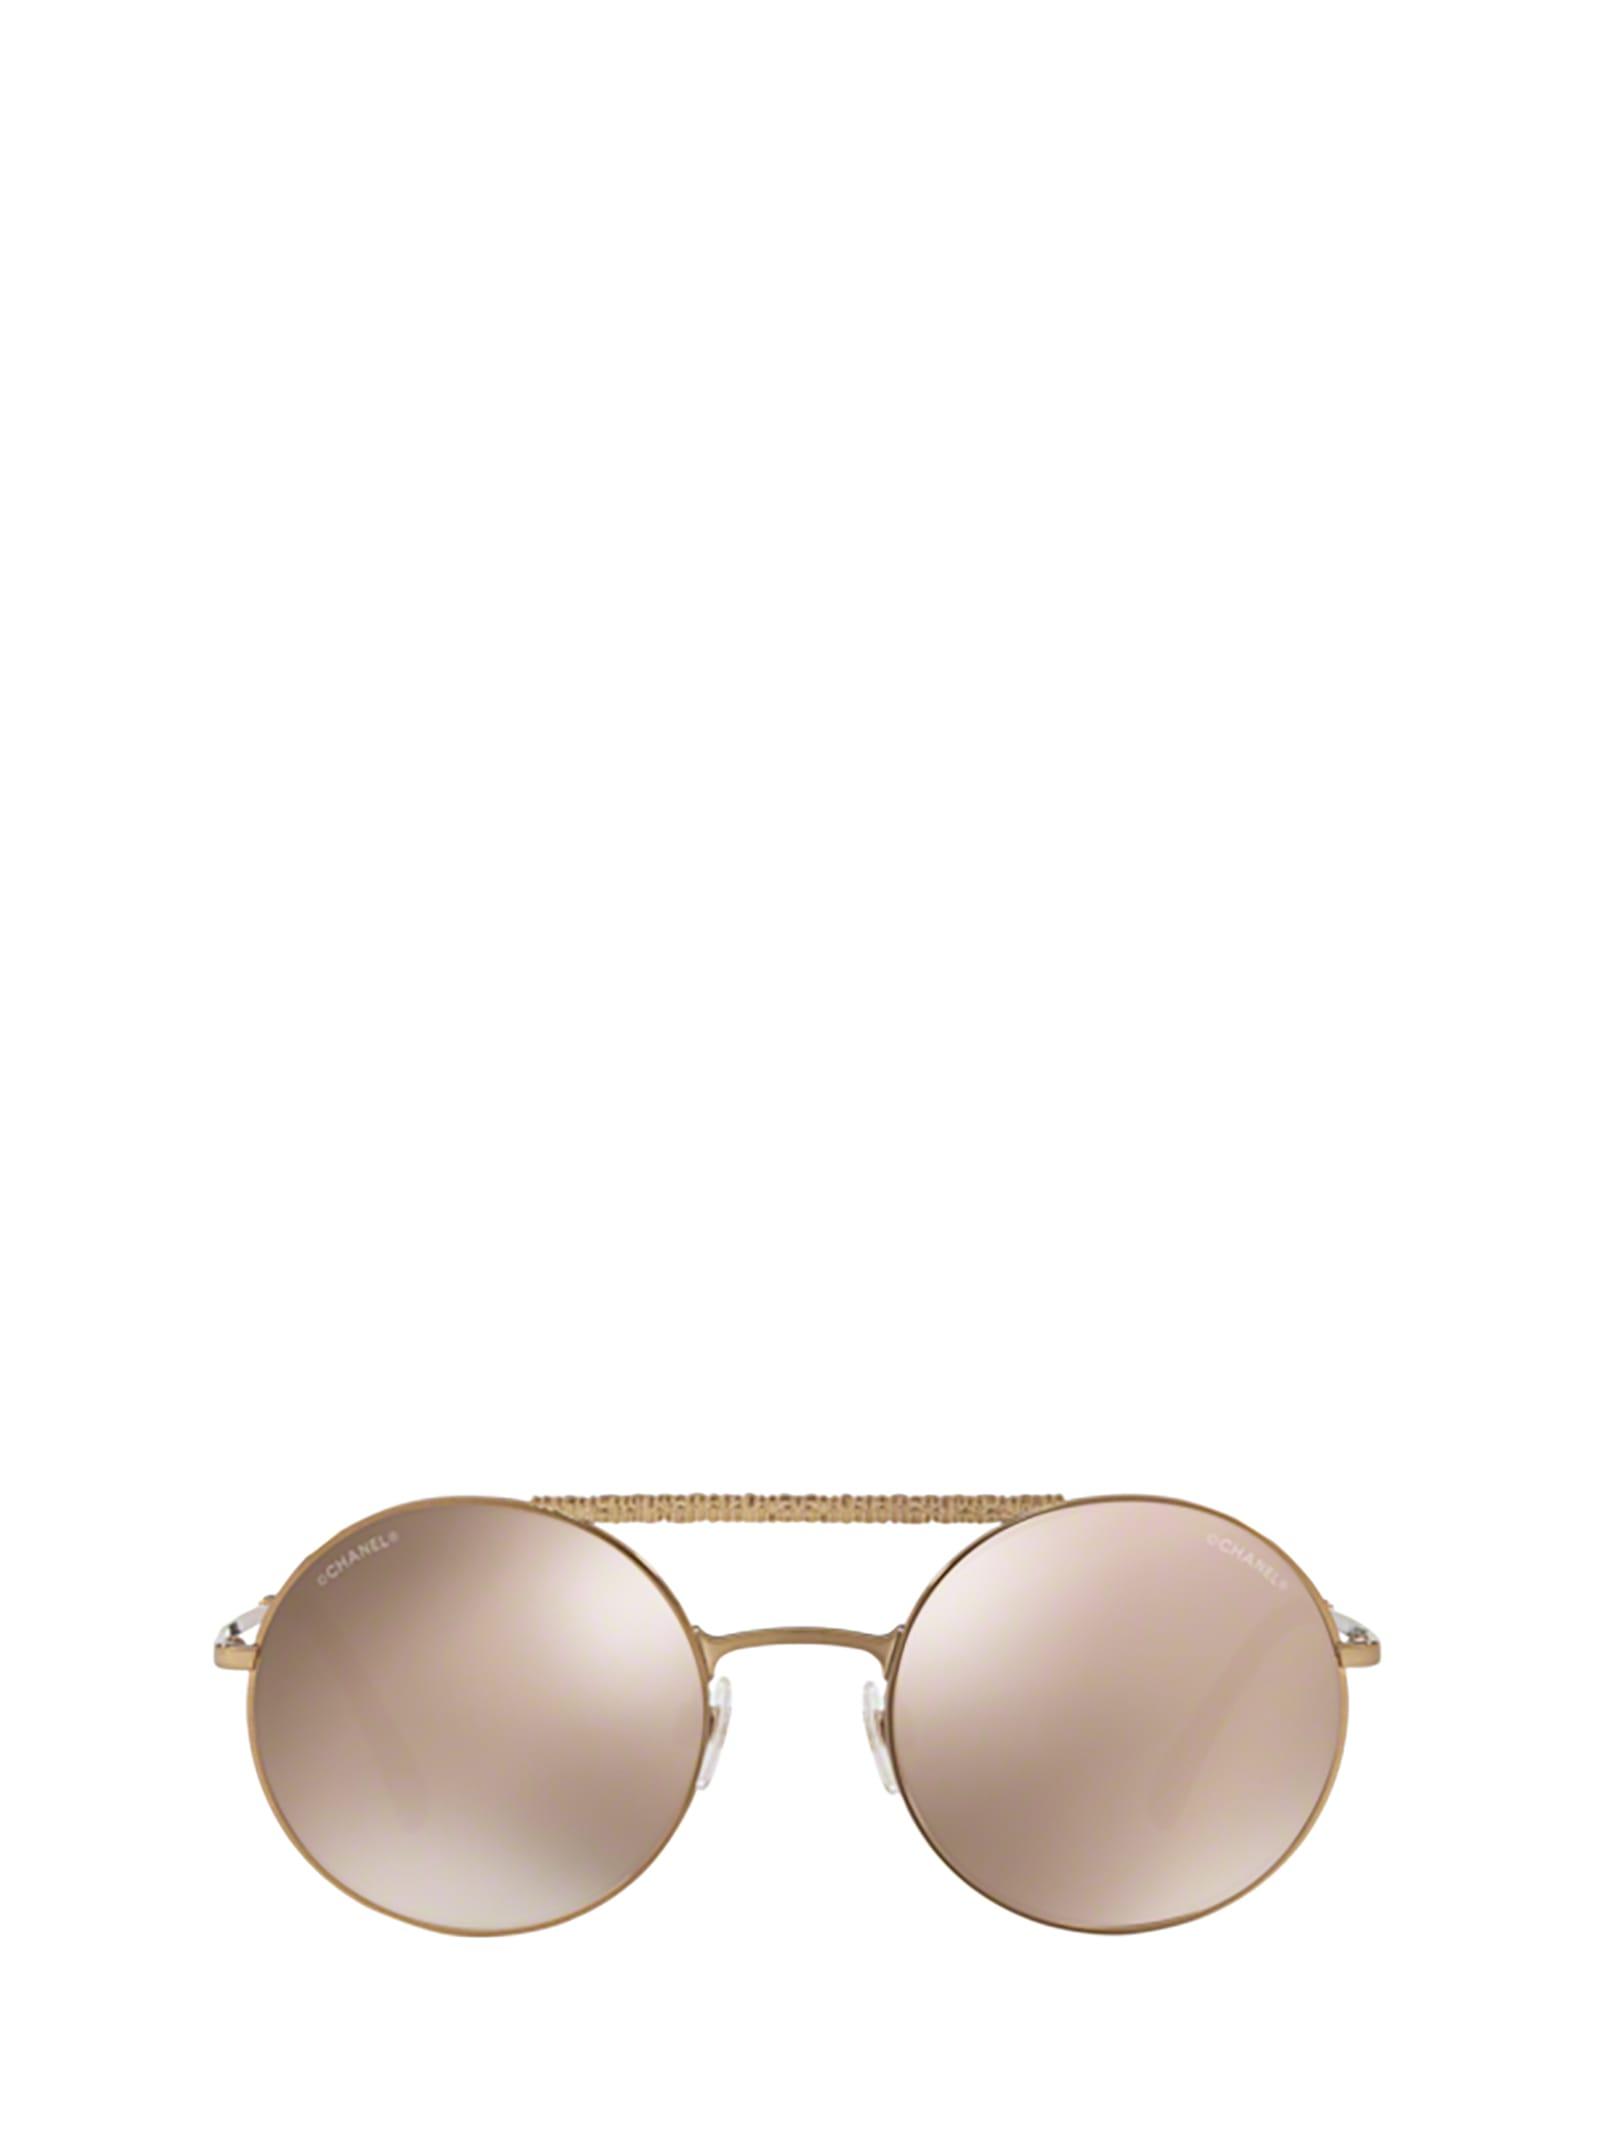 Chanel Chanel Ch4232 Antique Gold Sunglasses